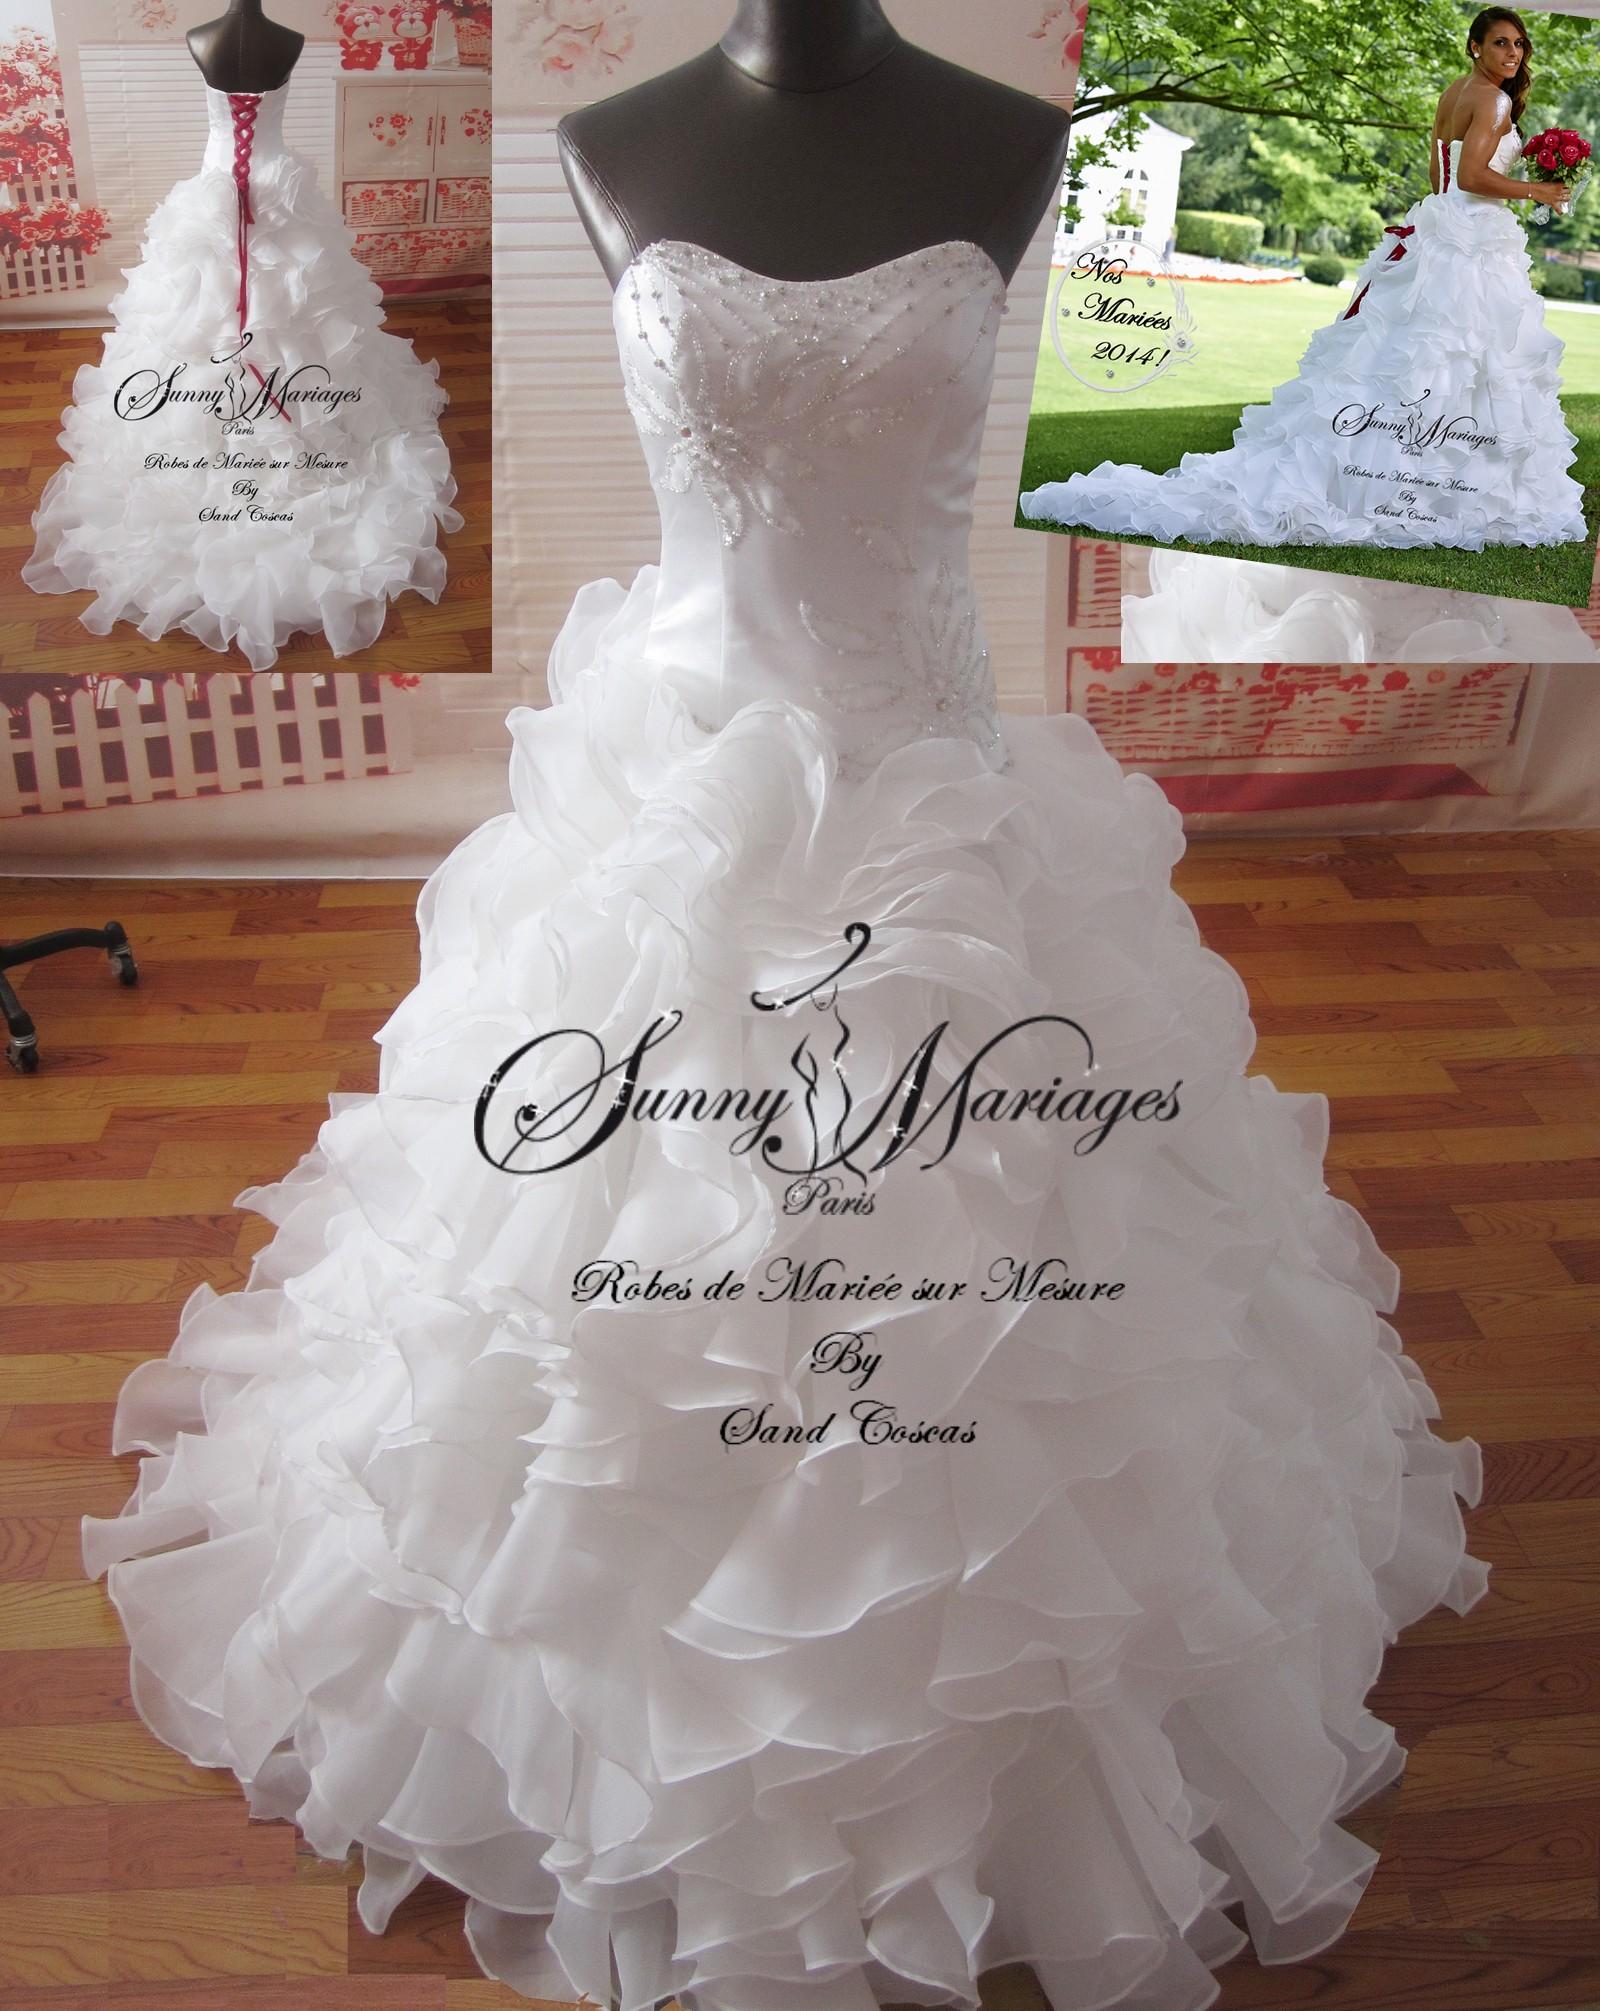 robe de mariee bustier jupe froufrou mariage jessica houara sunny mariage. Black Bedroom Furniture Sets. Home Design Ideas